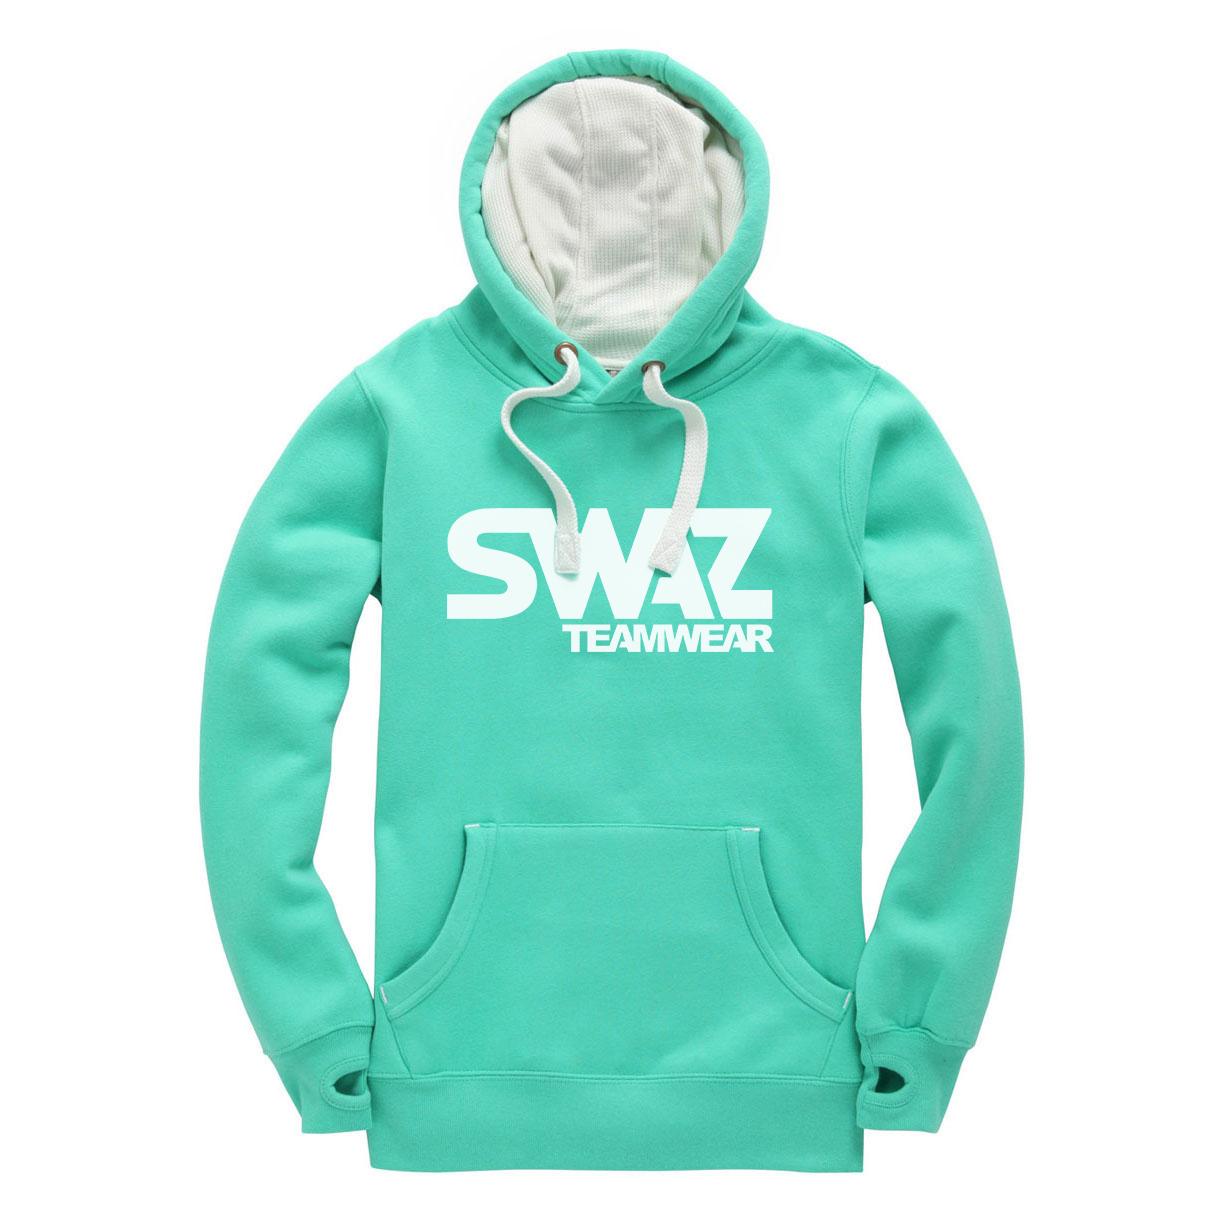 SWAZ Teamwear Classic Hoody – Gumdrop